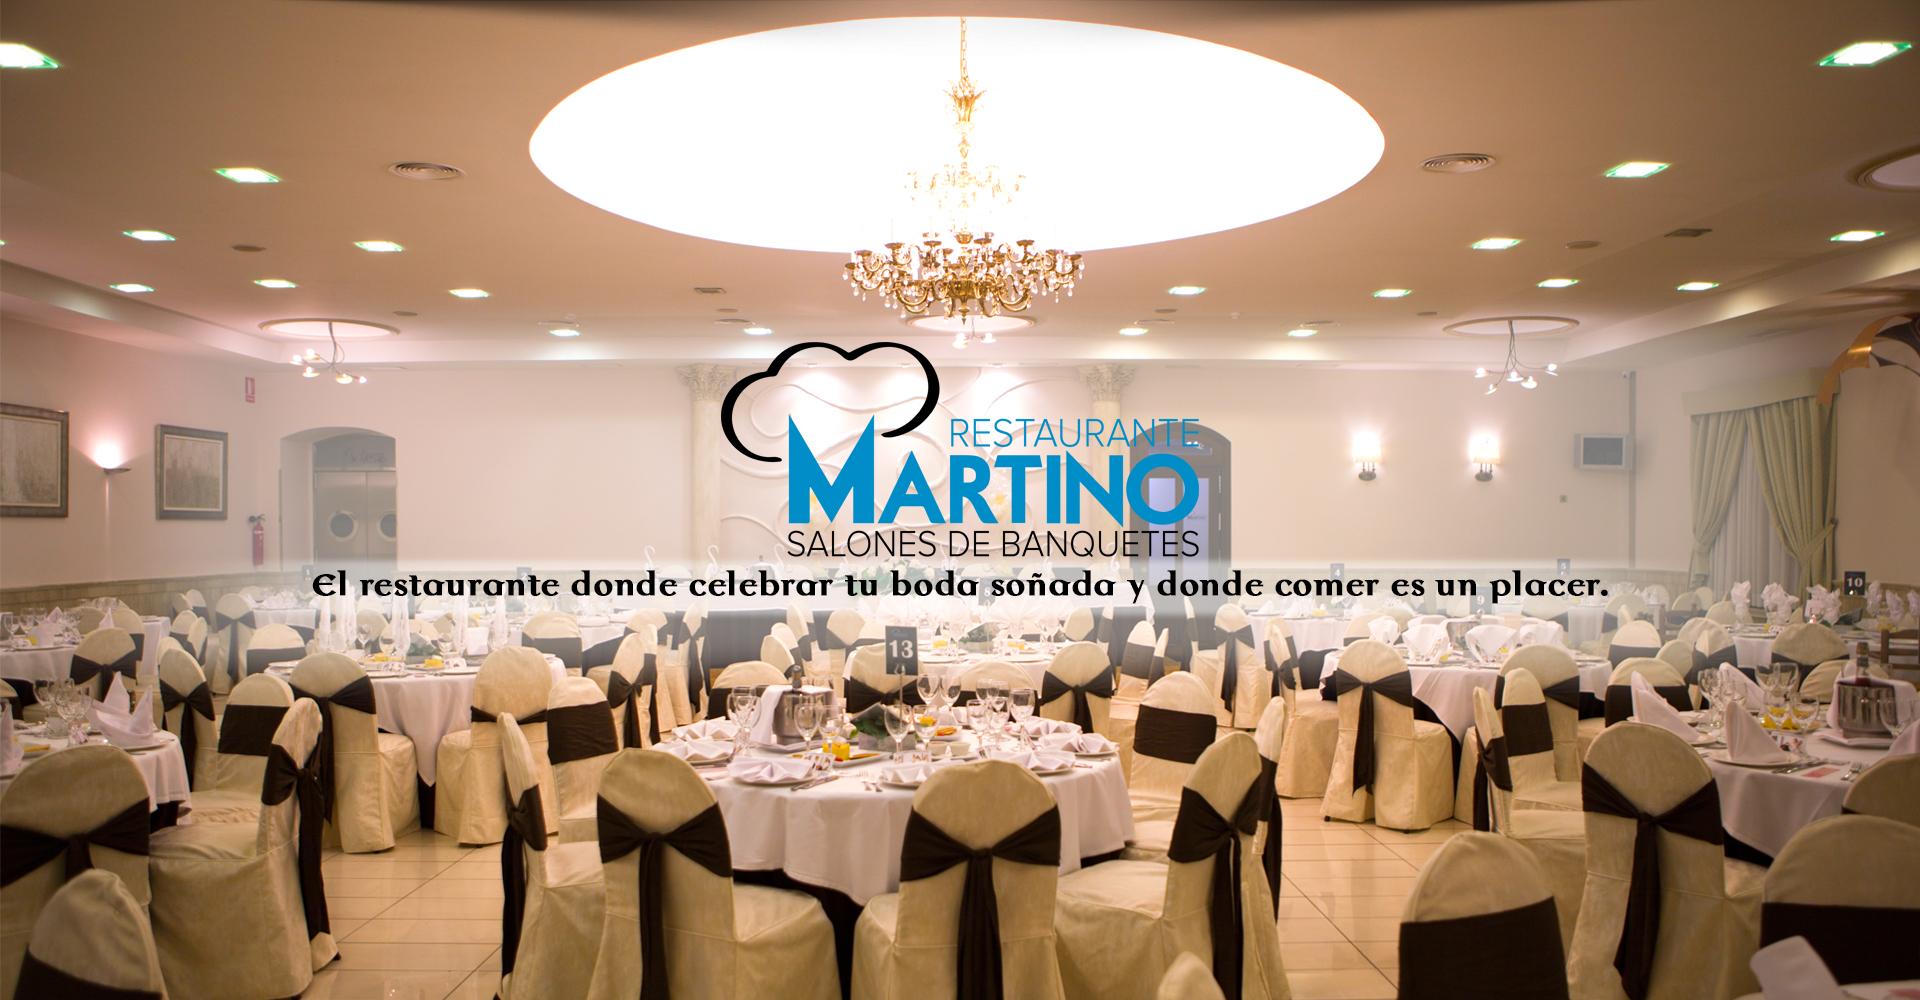 Restaurantes Martino en Elche, Restaurante en elche, restaurante en santa pola, restaurante bodas